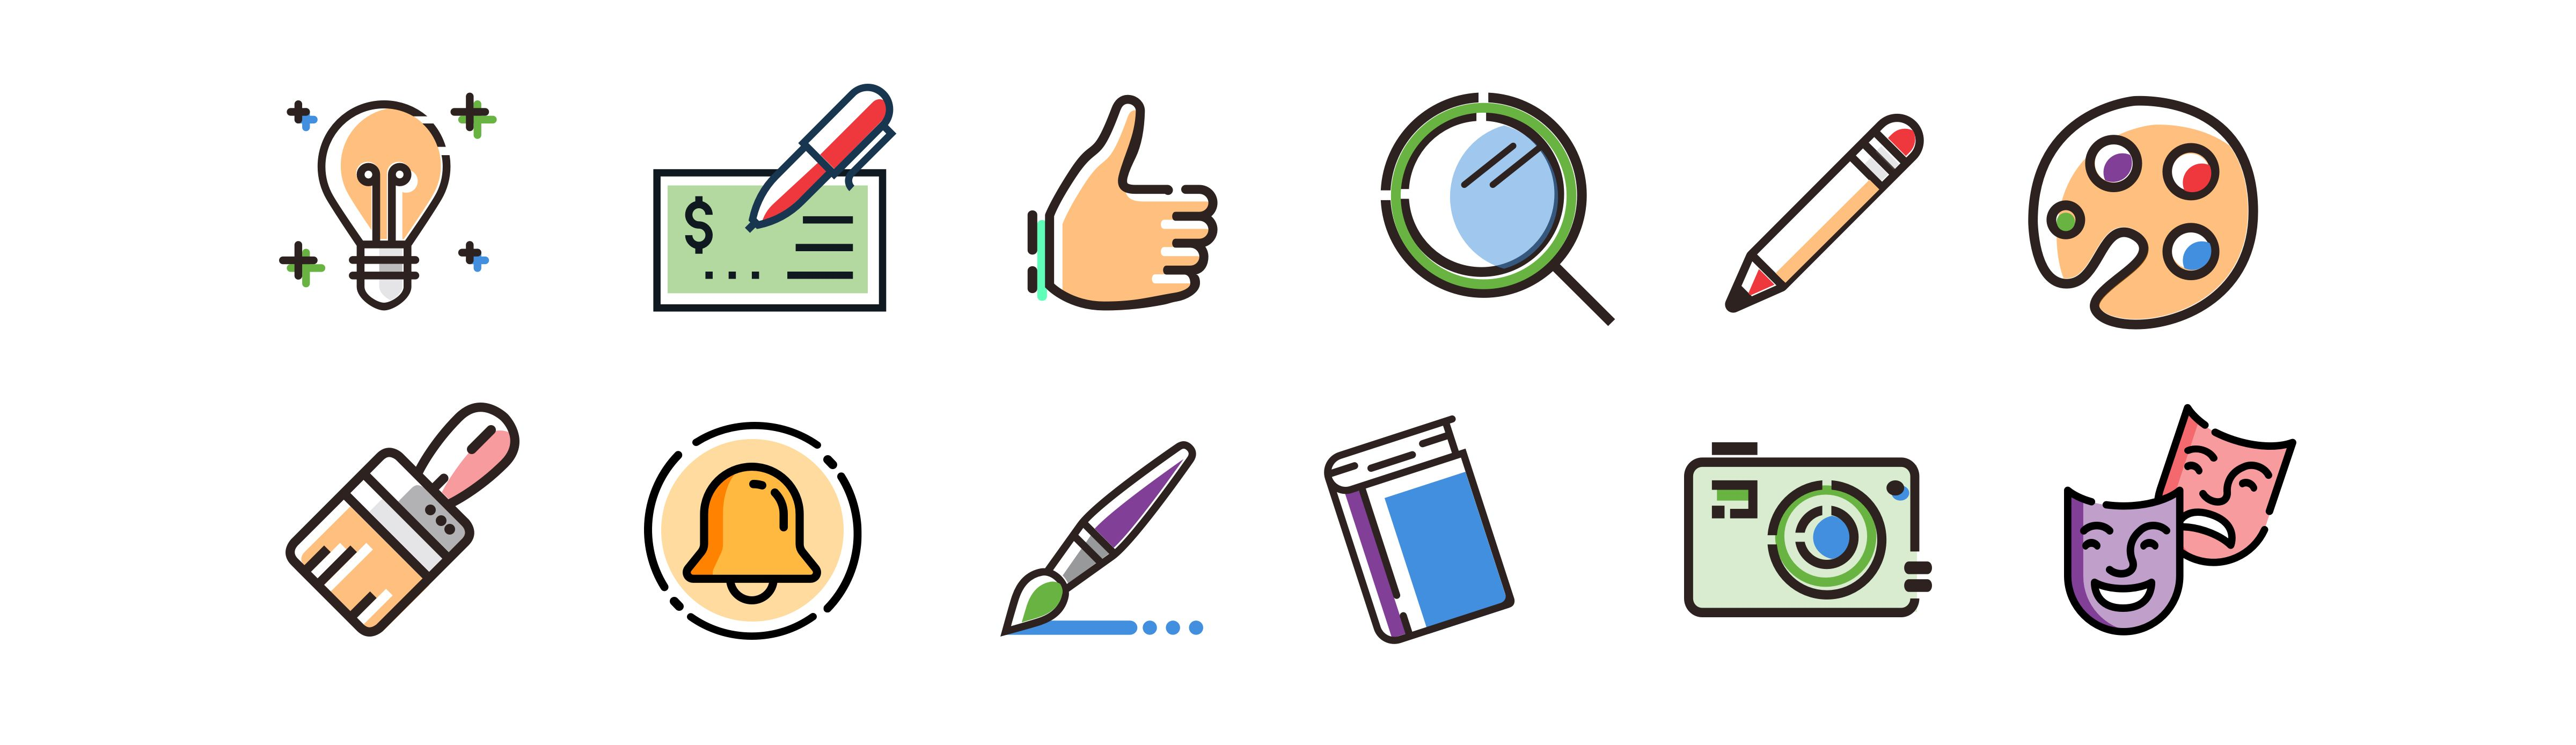 Icons@2x.jpg